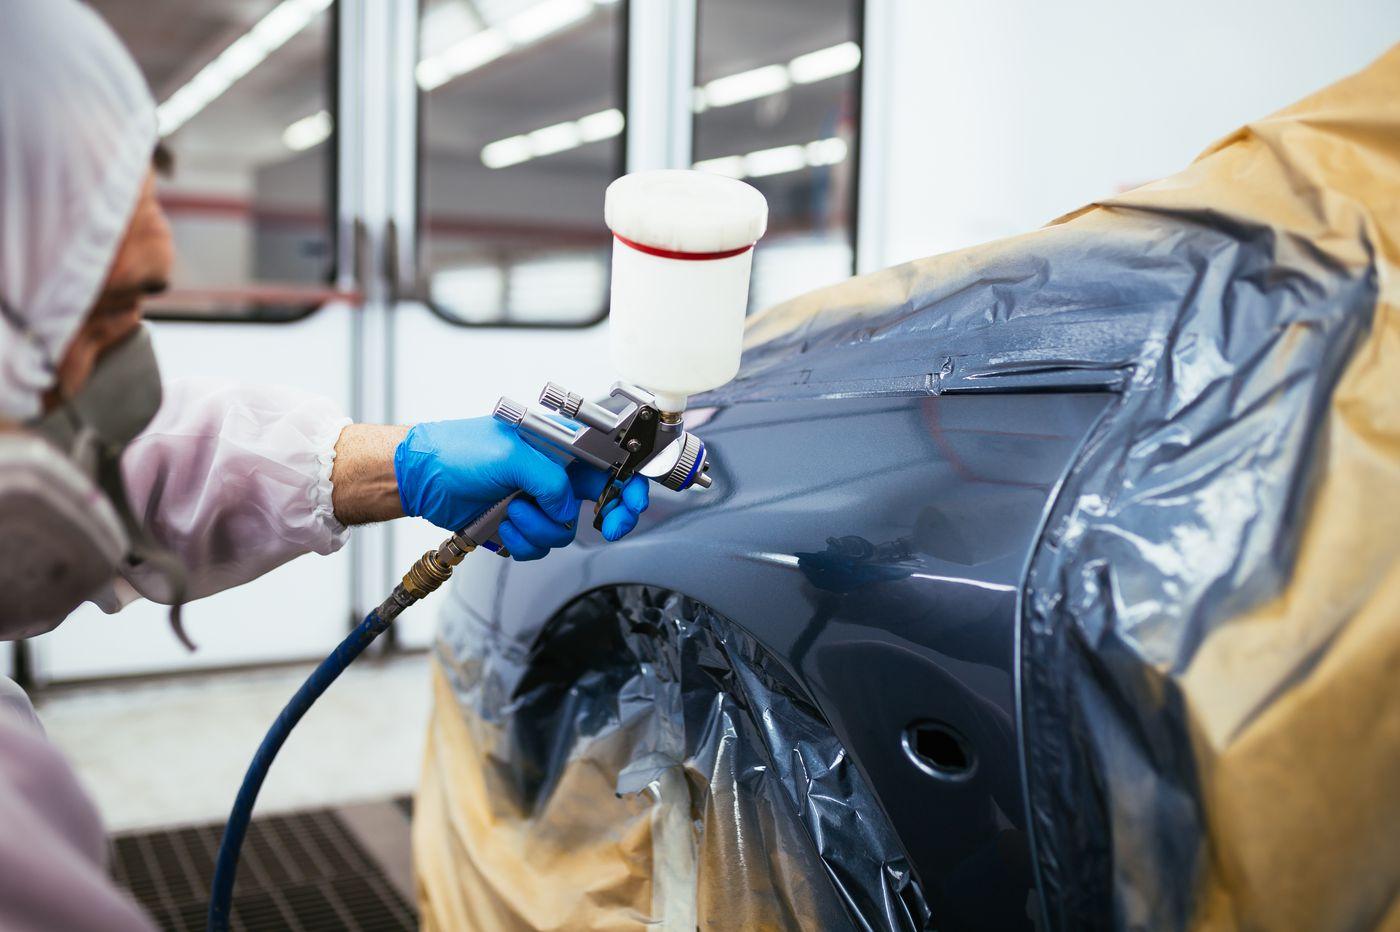 Damage control: Don't let an auto body shop wreck your wallet